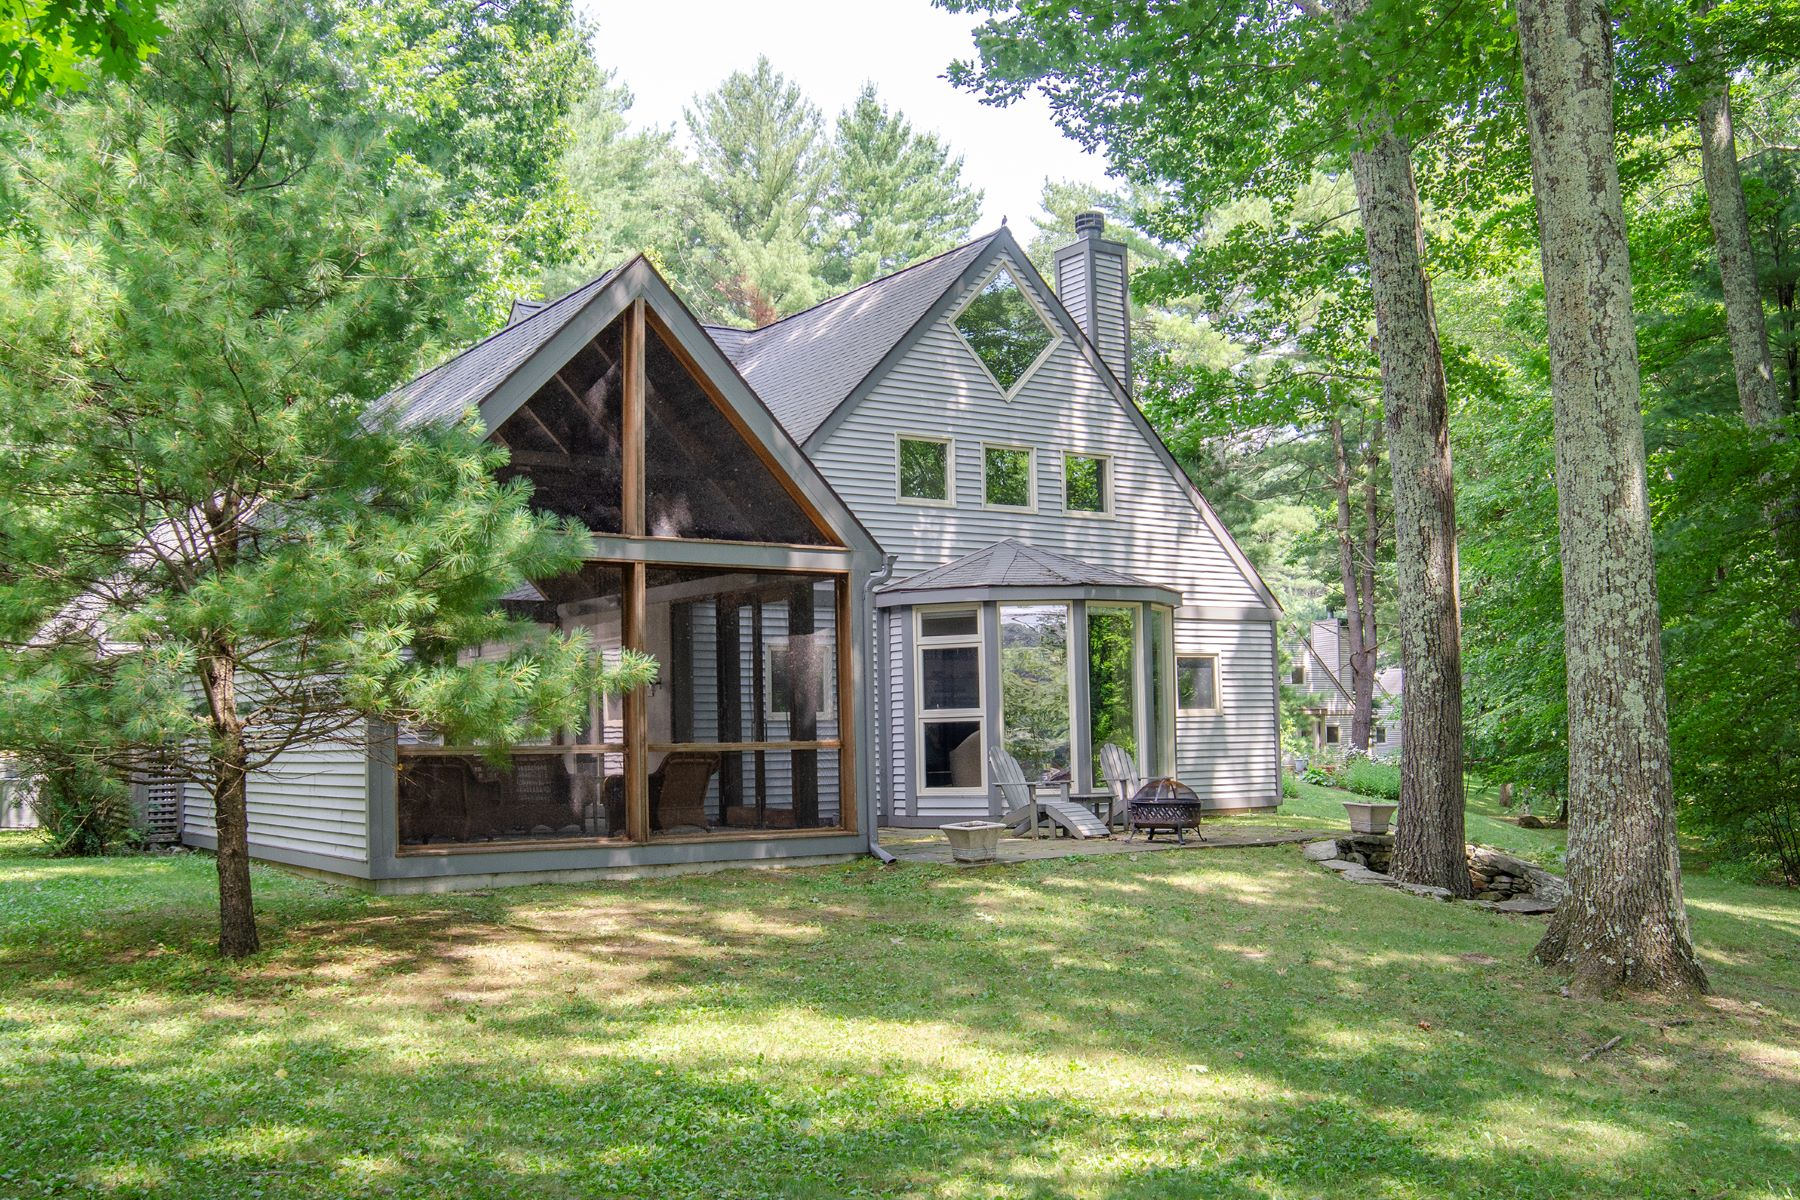 Single Family Homes for Sale at Idyllic Waterfront at Long Lake 134 Arcadia Ancram, New York 12502 United States